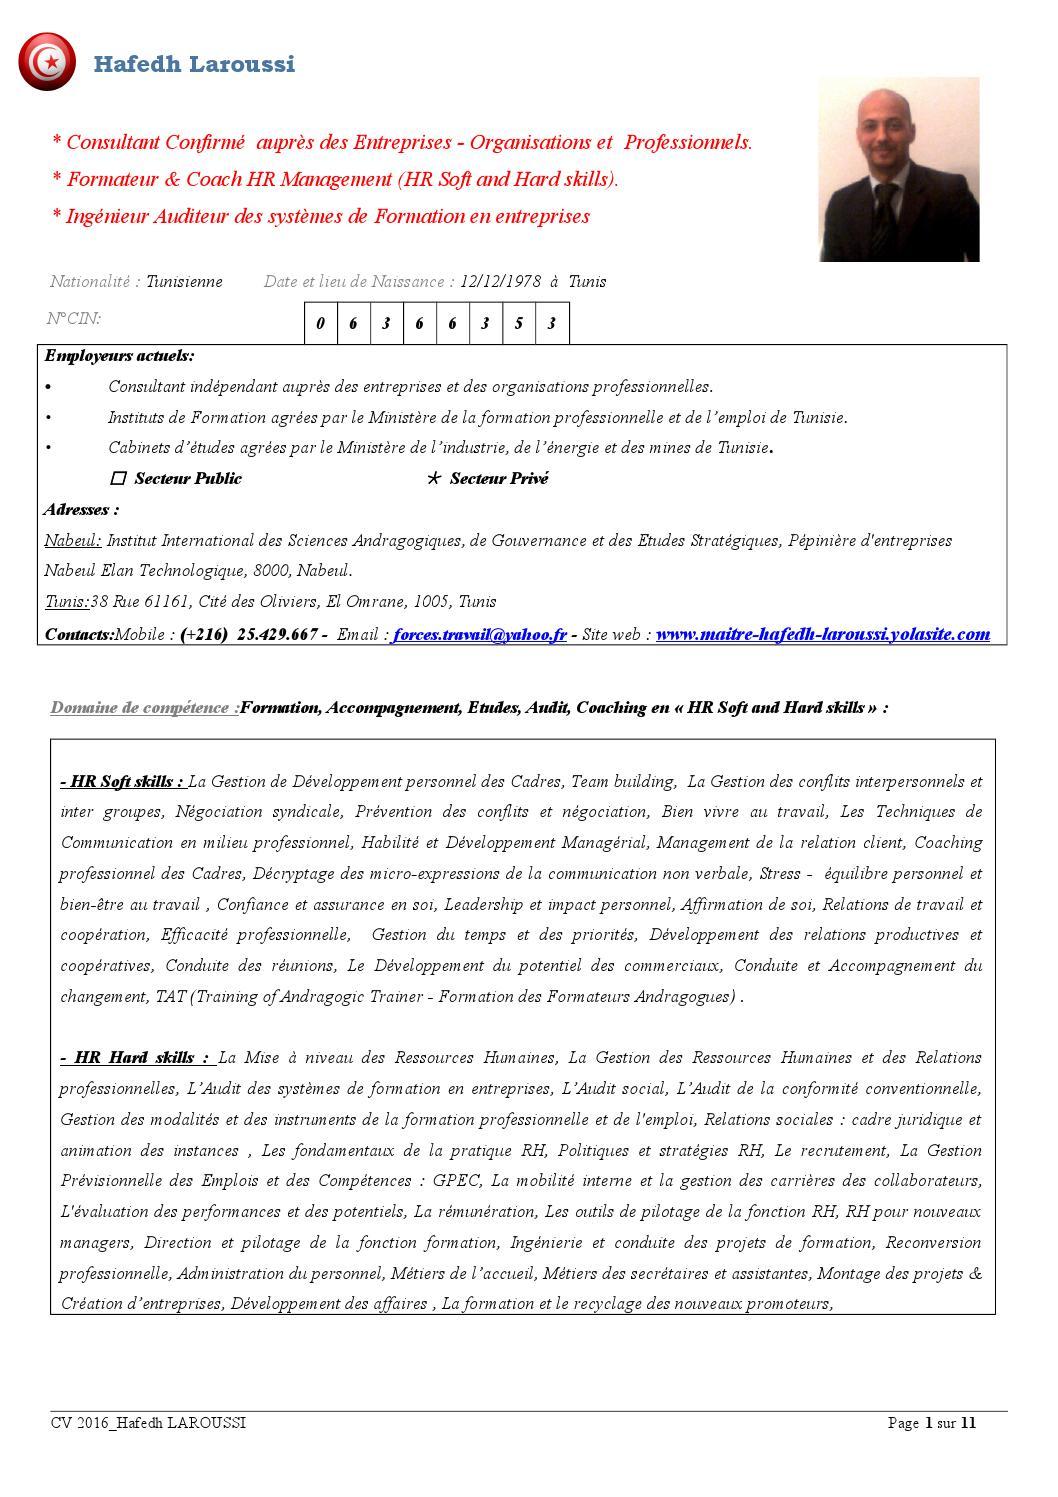 cv formateur consultant tunisien hafedh laroussi hr skills 01 01 2016 by hafedh laroussi